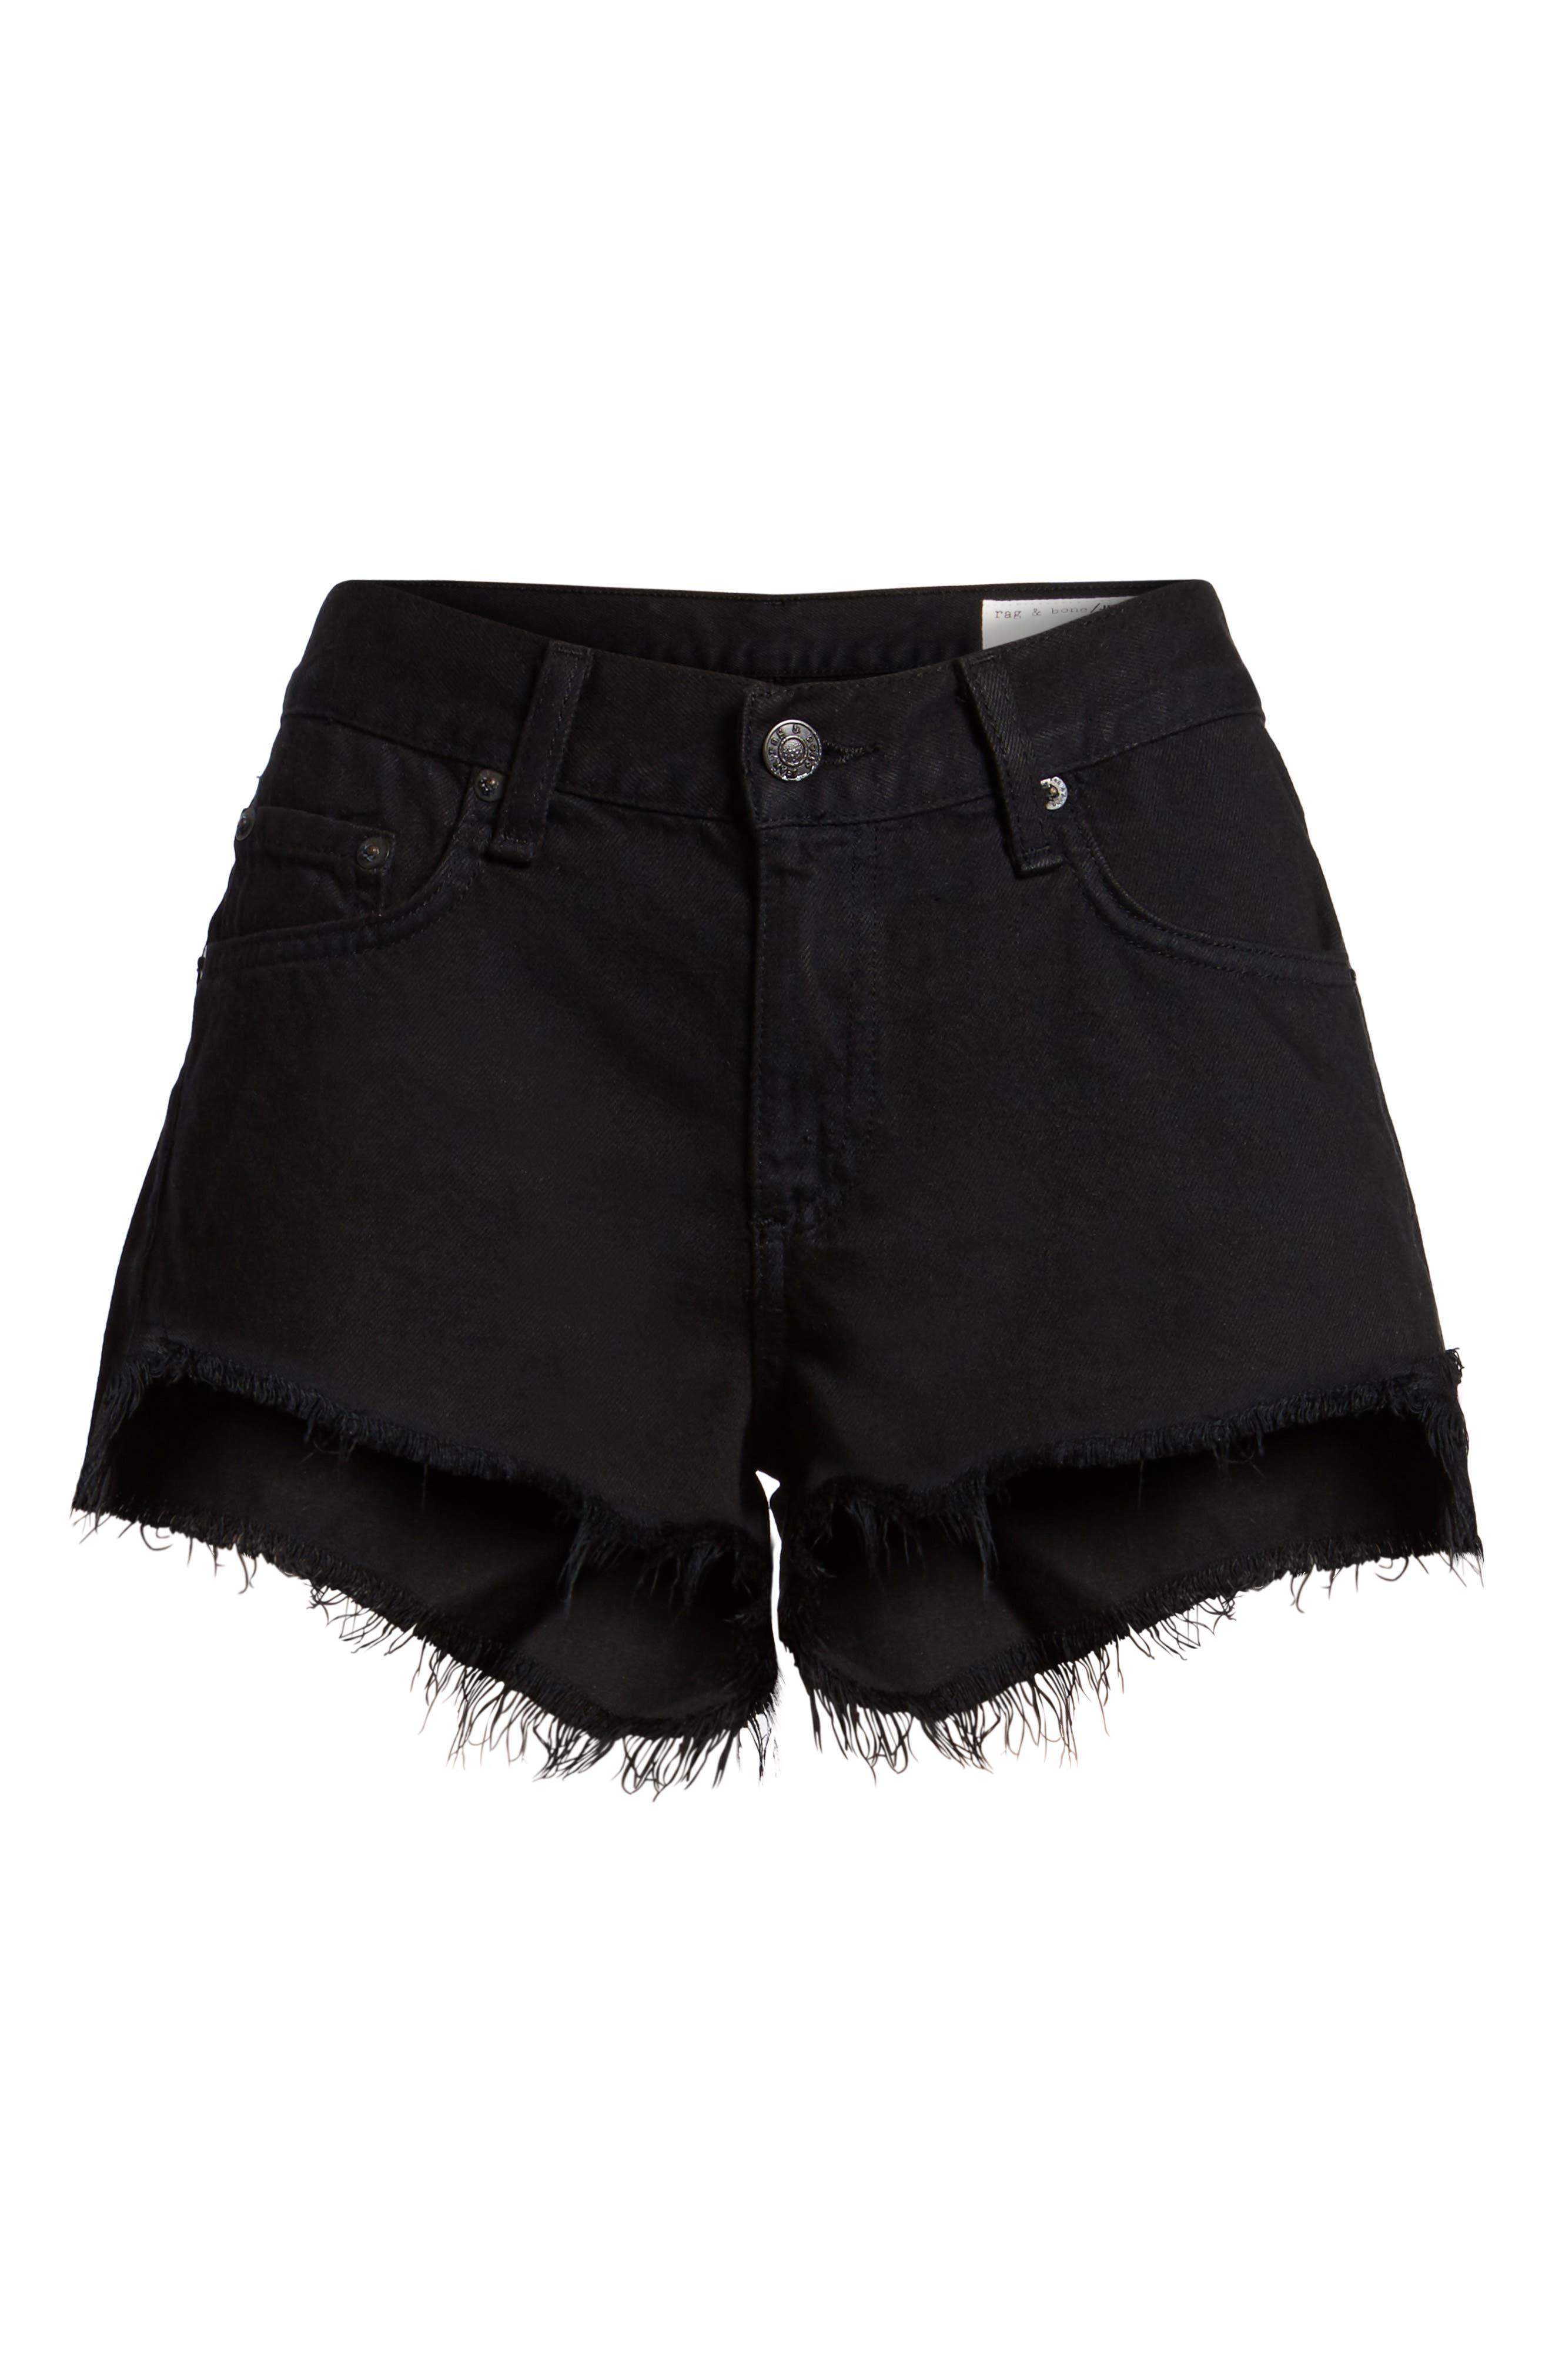 Cutoff Denim Shorts,                             Alternate thumbnail 2, color,                             001